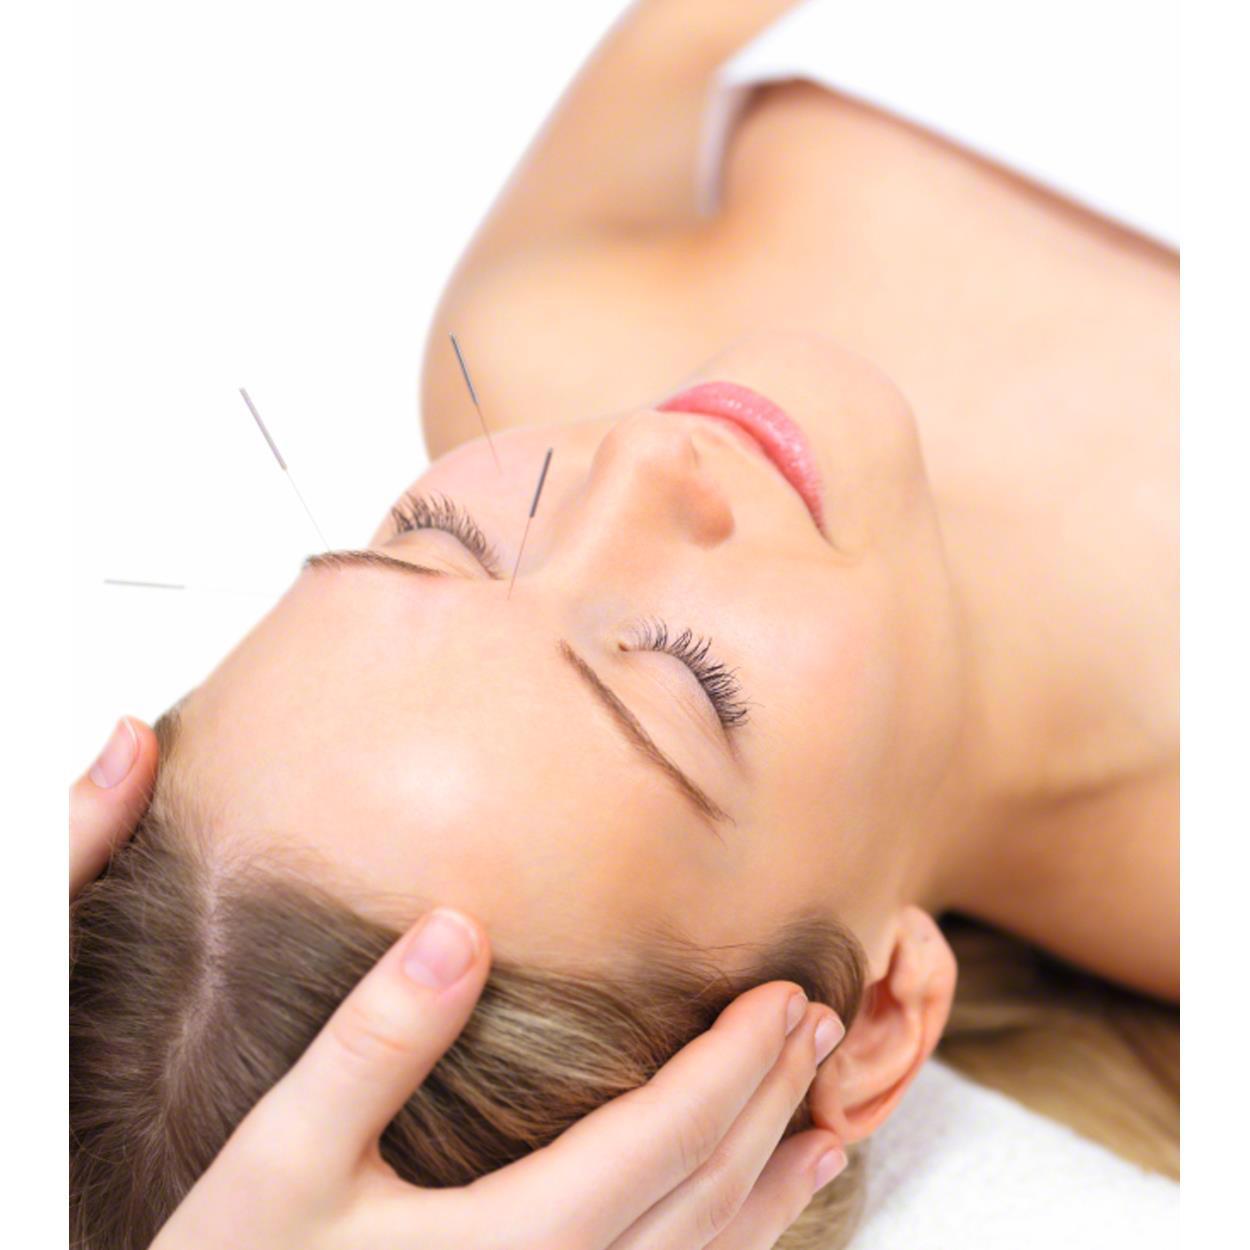 intim massage kneppe maskiner